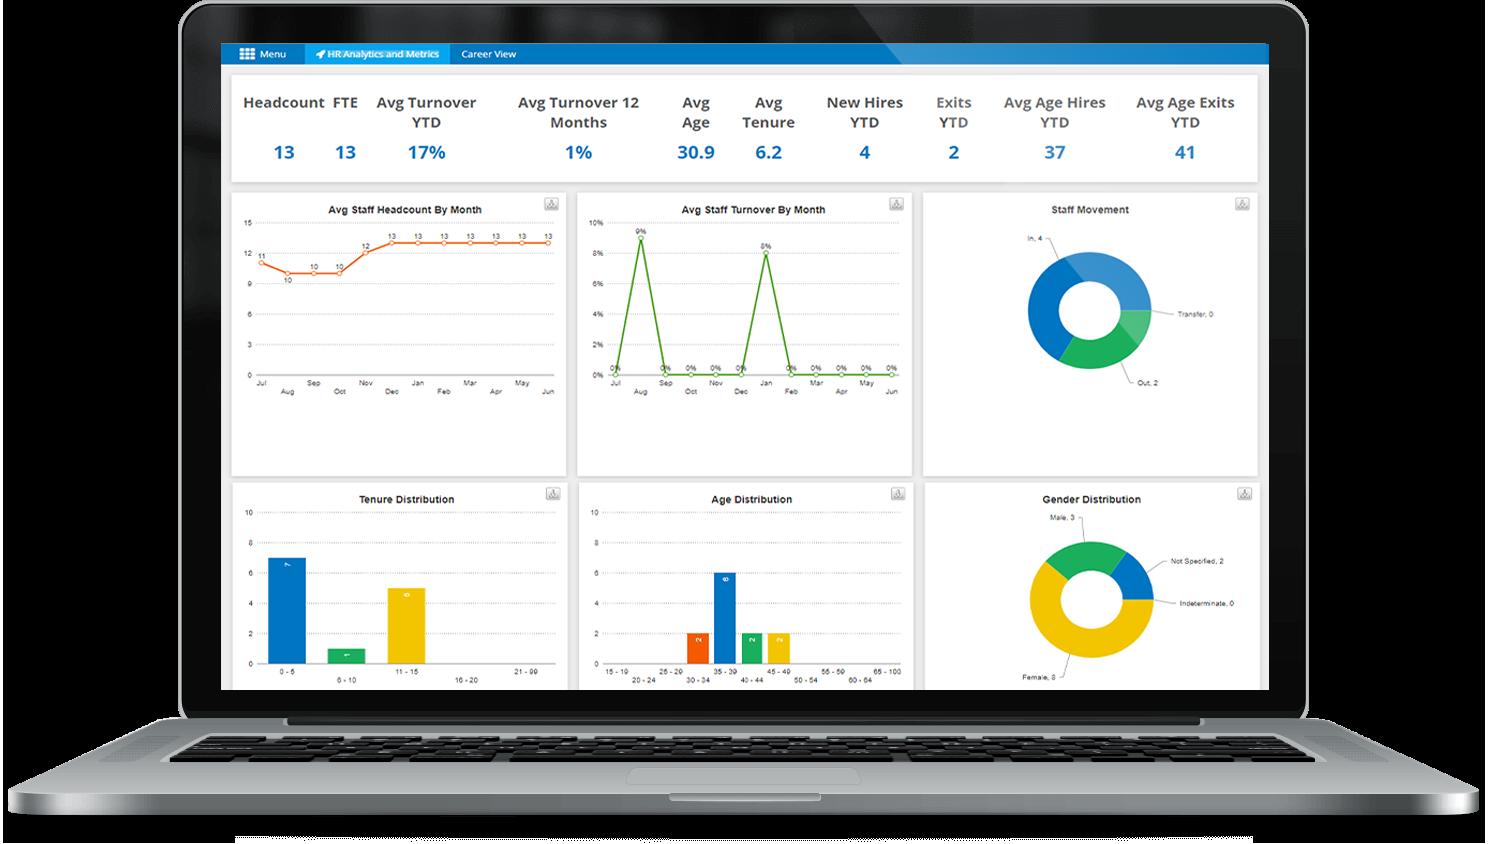 HR Analytics & Metrics